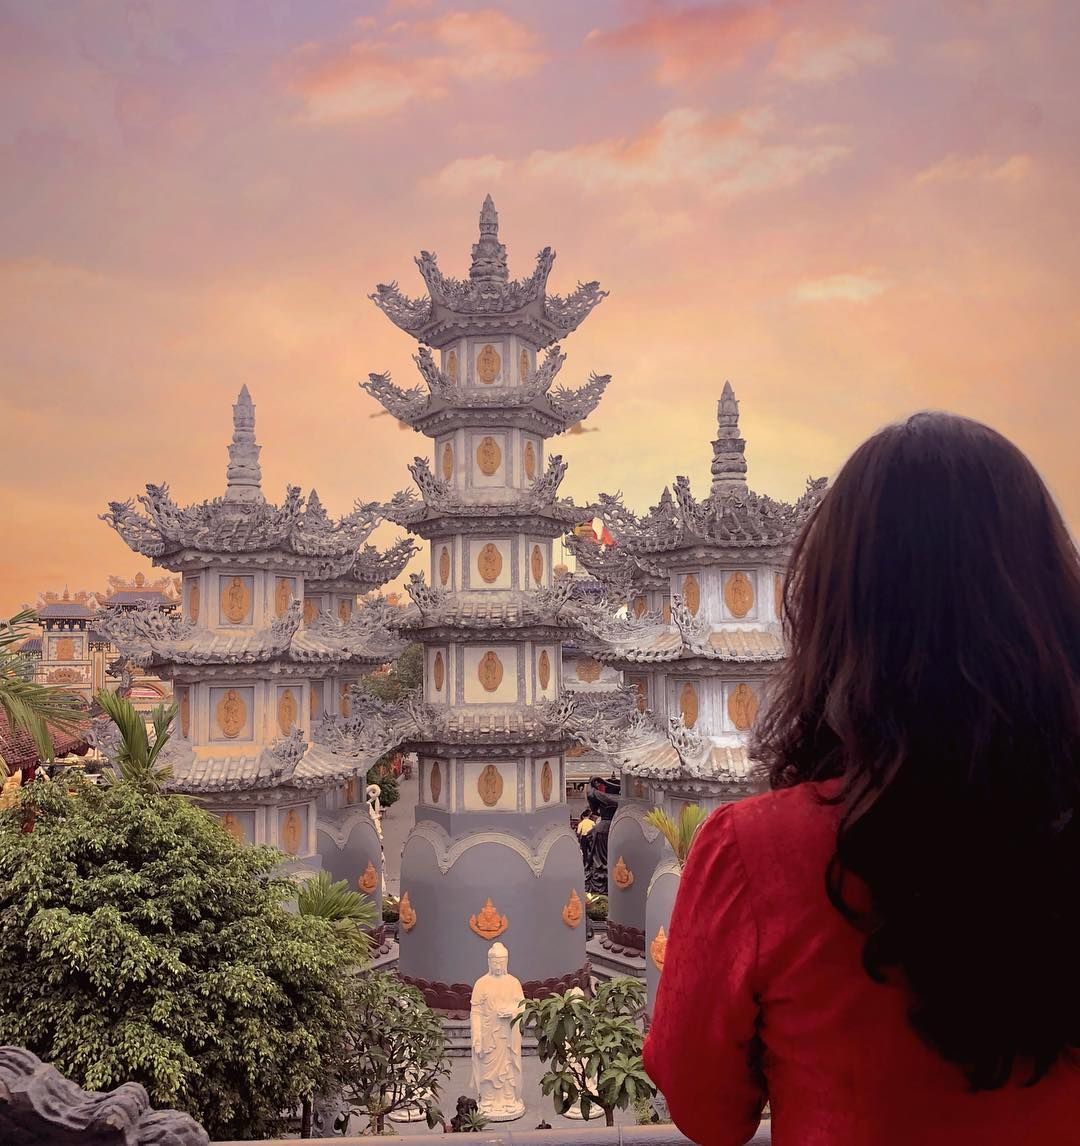 Nhung-ngoi-chua-dep-va-linh-thieng-nhat-Hai-Phong